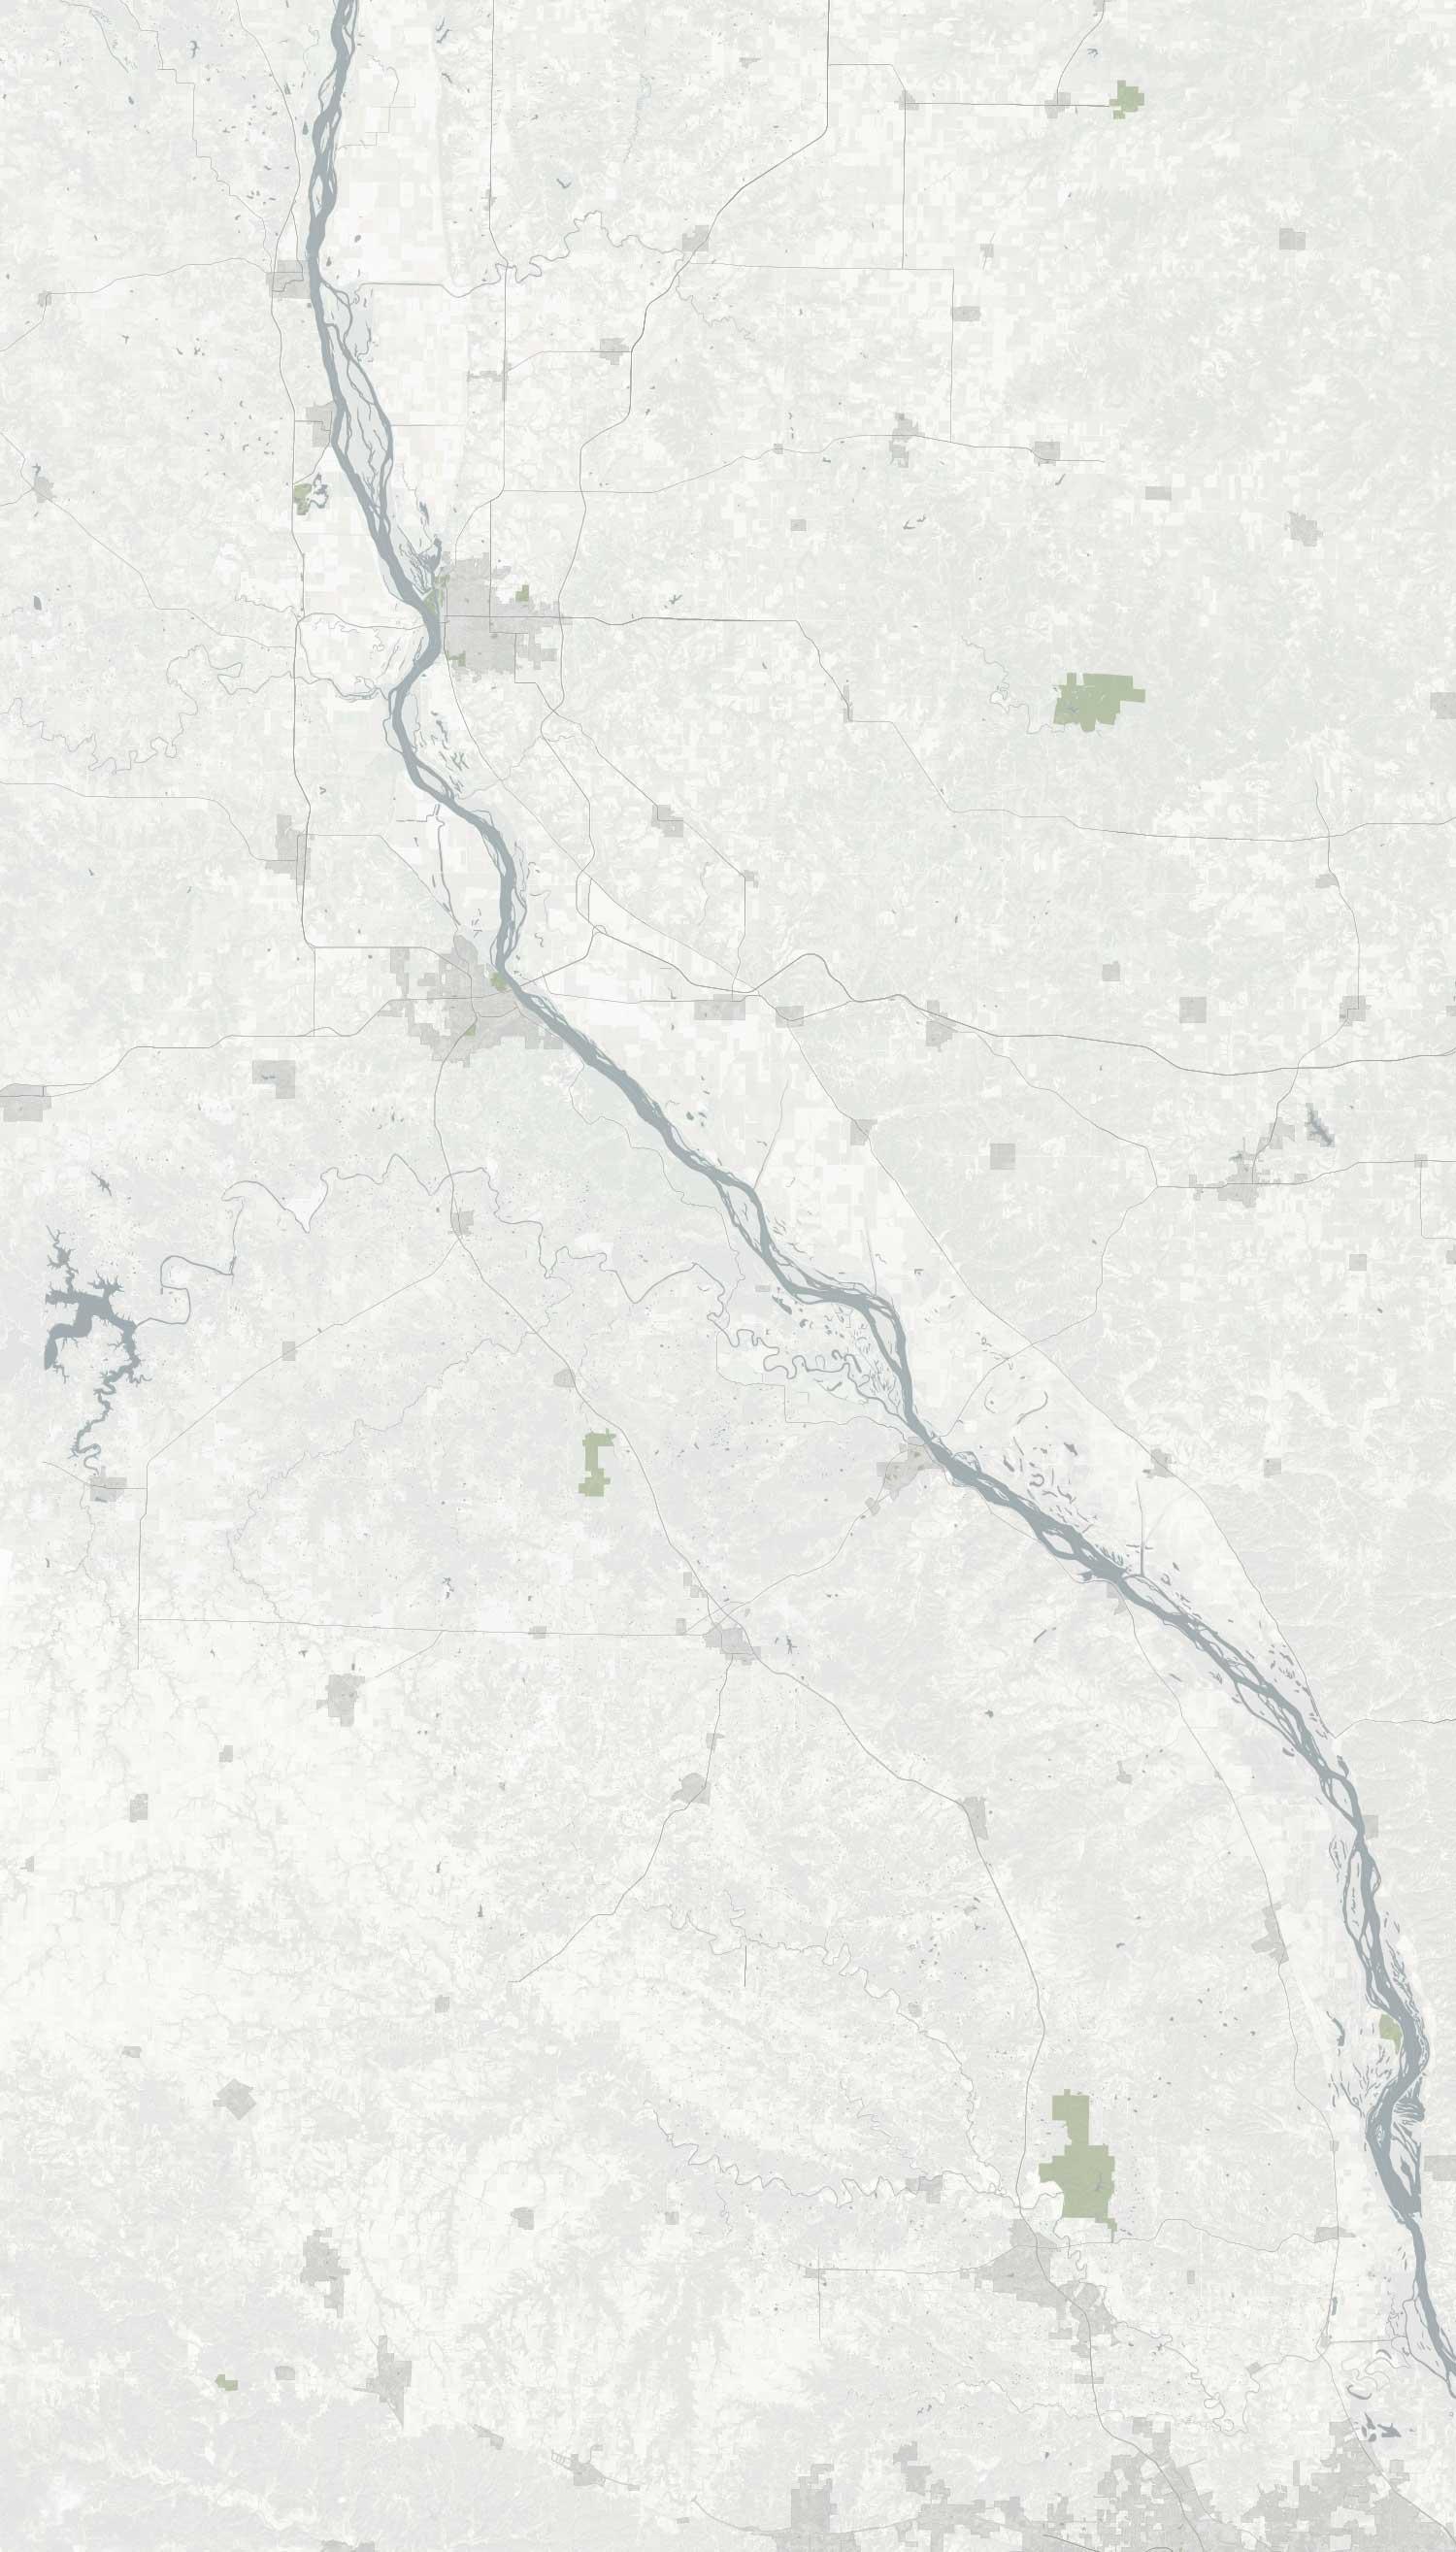 How Overbuilt Levees Along the Upper Mississippi River Push